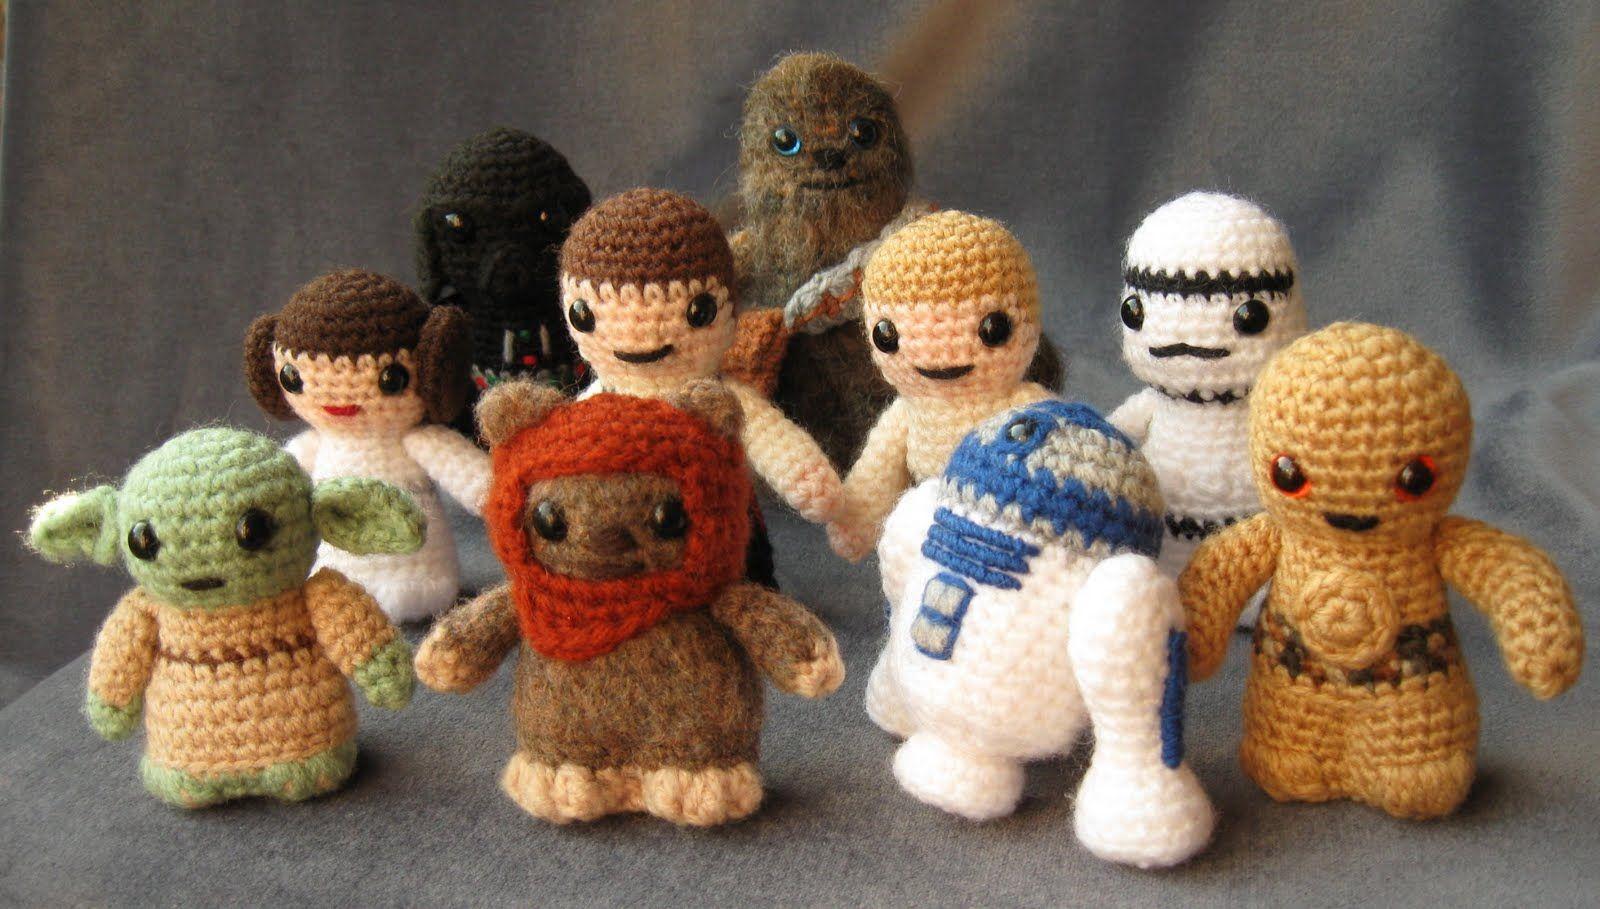 Amigurumi Star Wars Gratuit : Crochet your own action figures amigurumi crochet and yarns